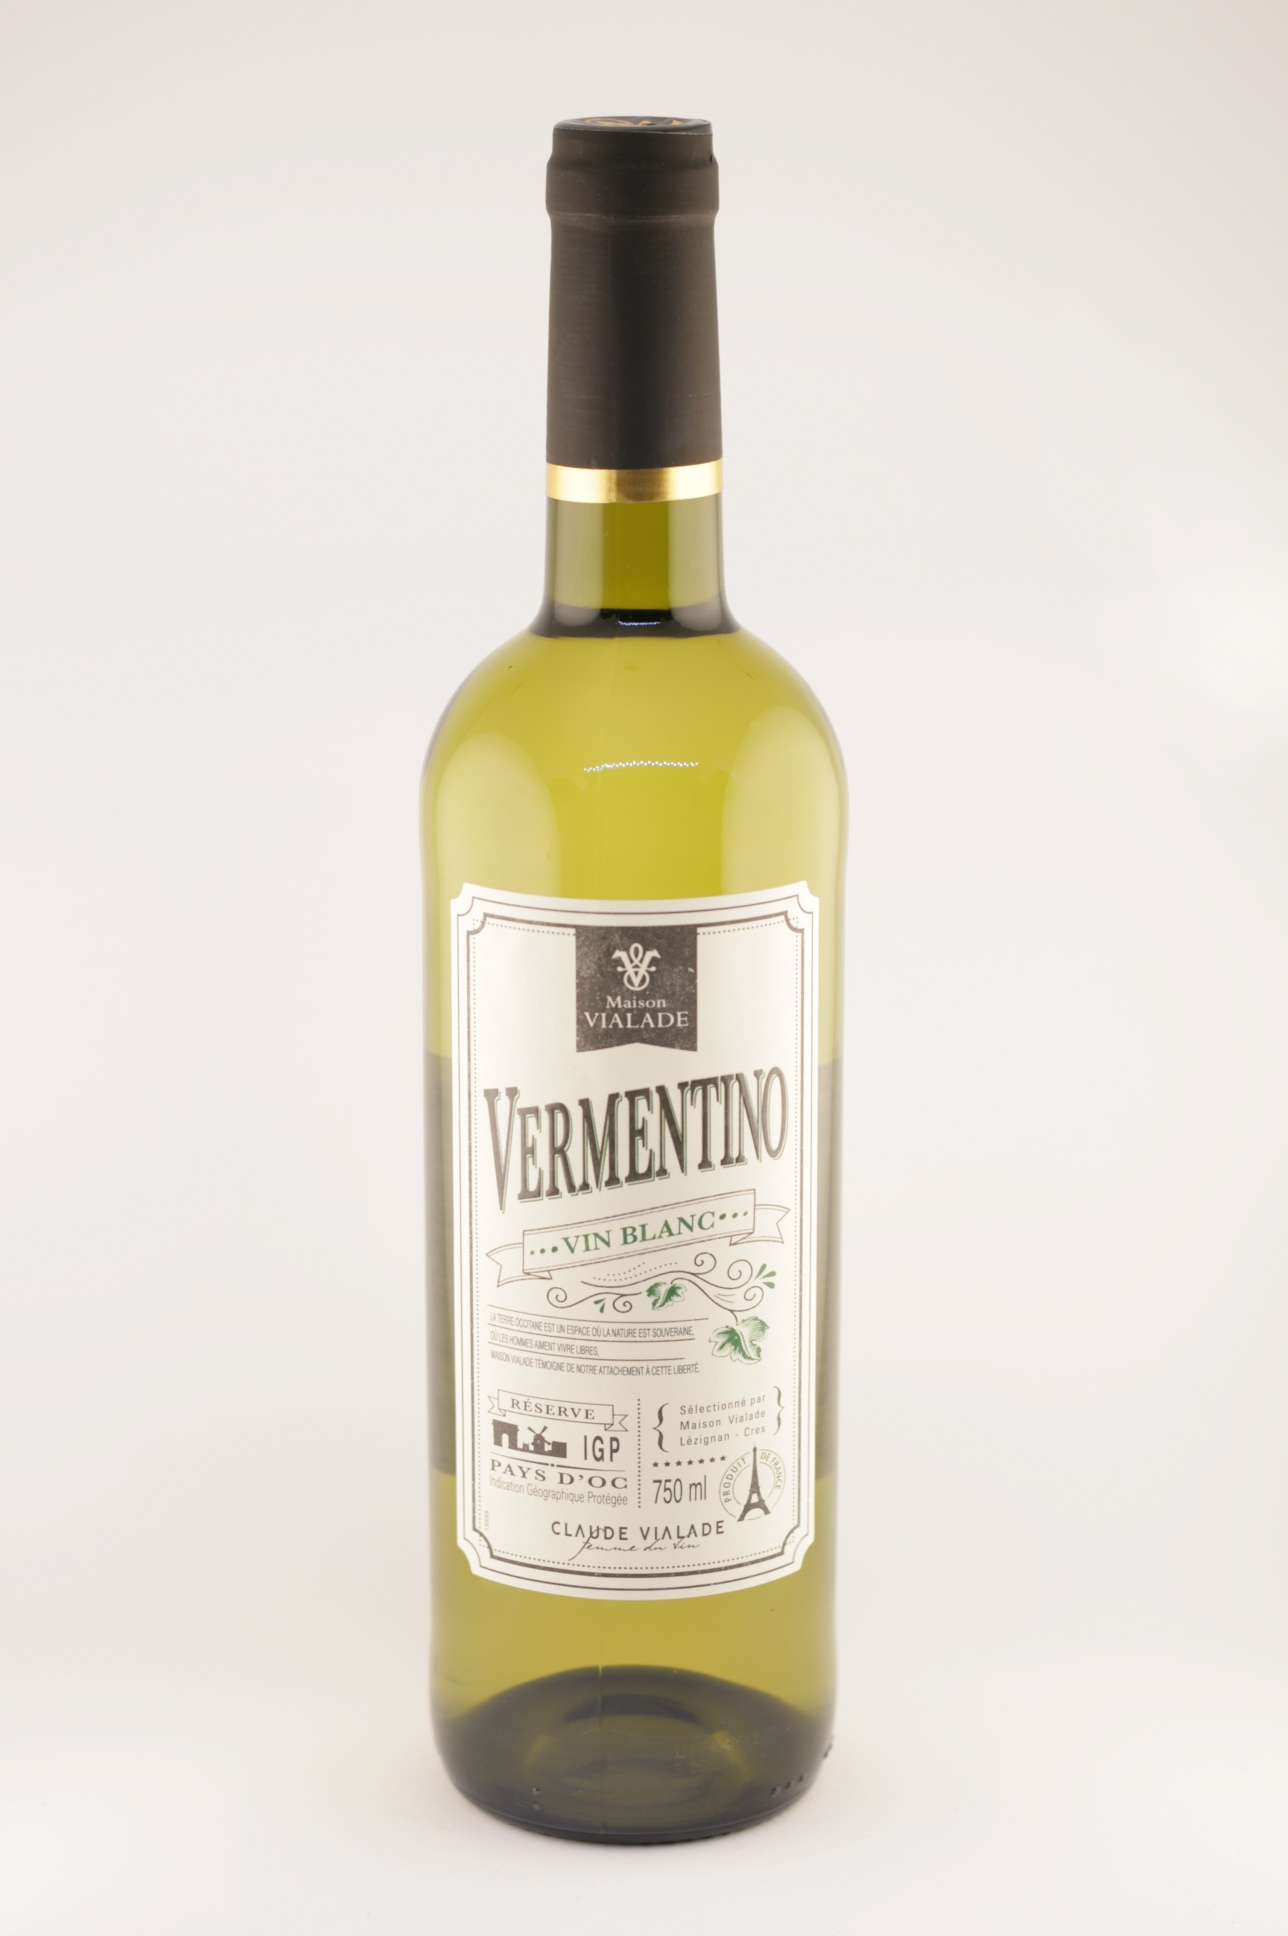 Claude| Vin Blanc Reserve | Maison Vialade | 2018 | Pay D'Oc | Vermentino